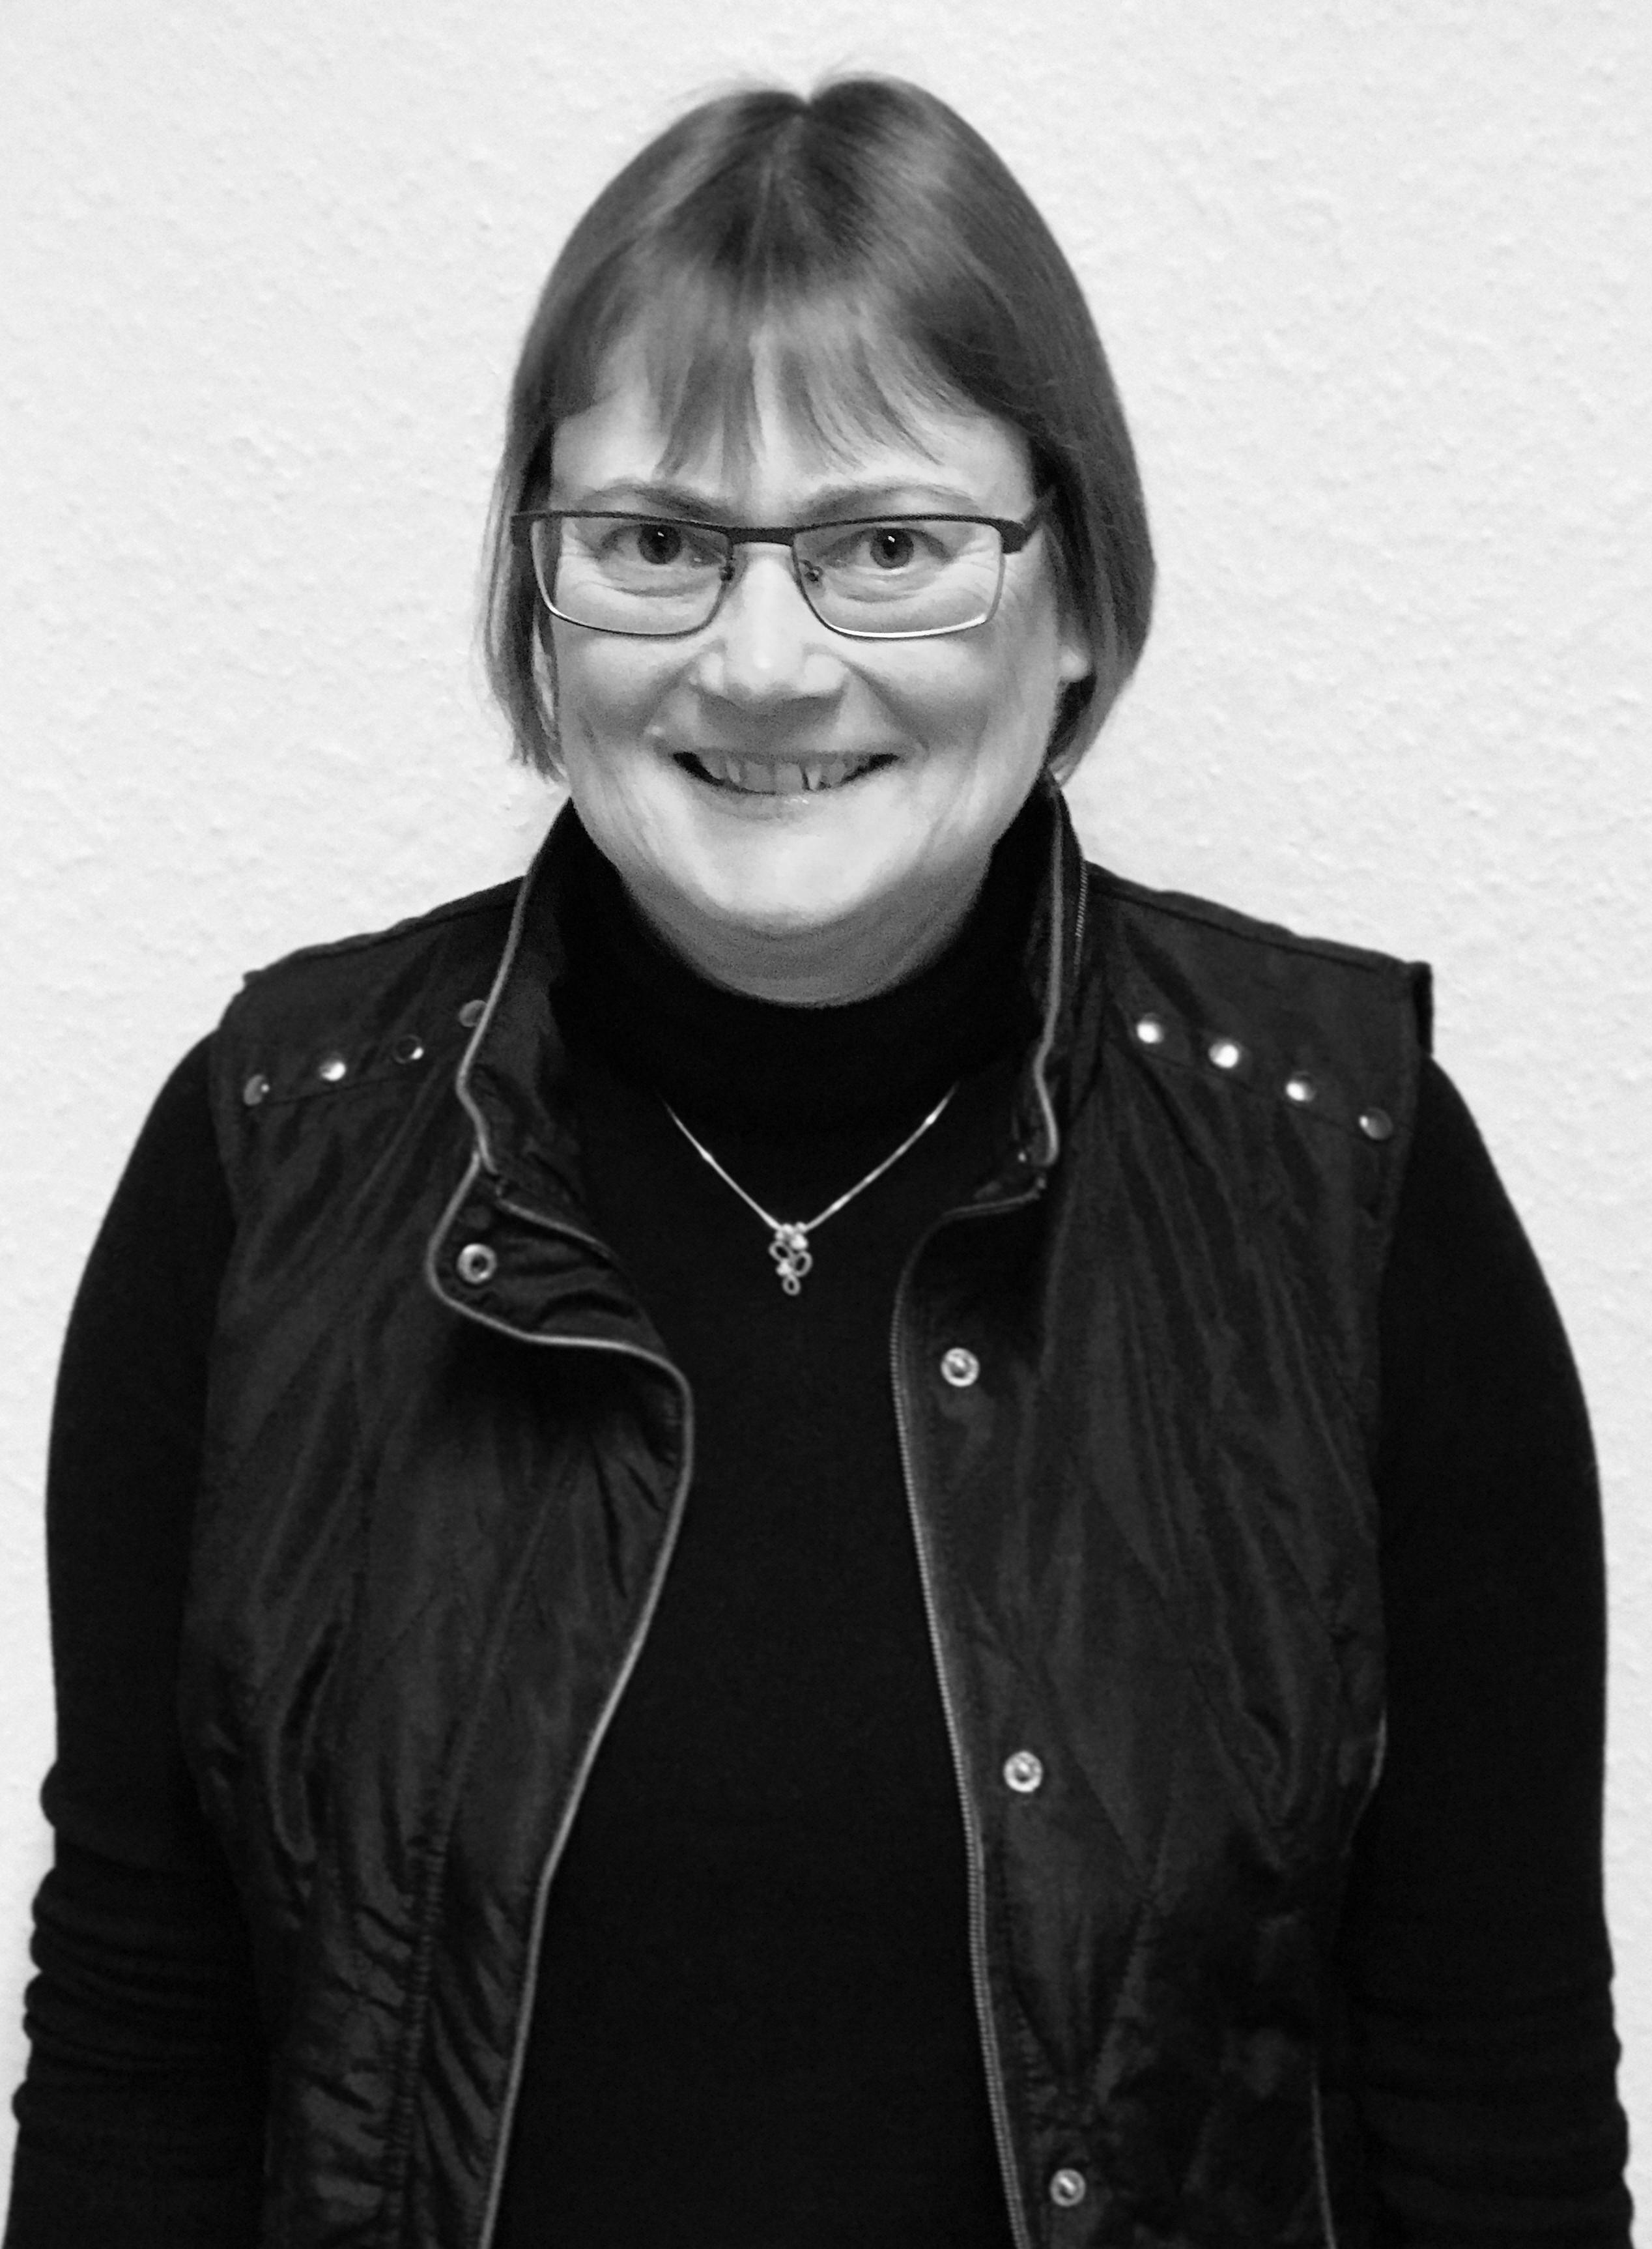 Dorthe Reinhardt